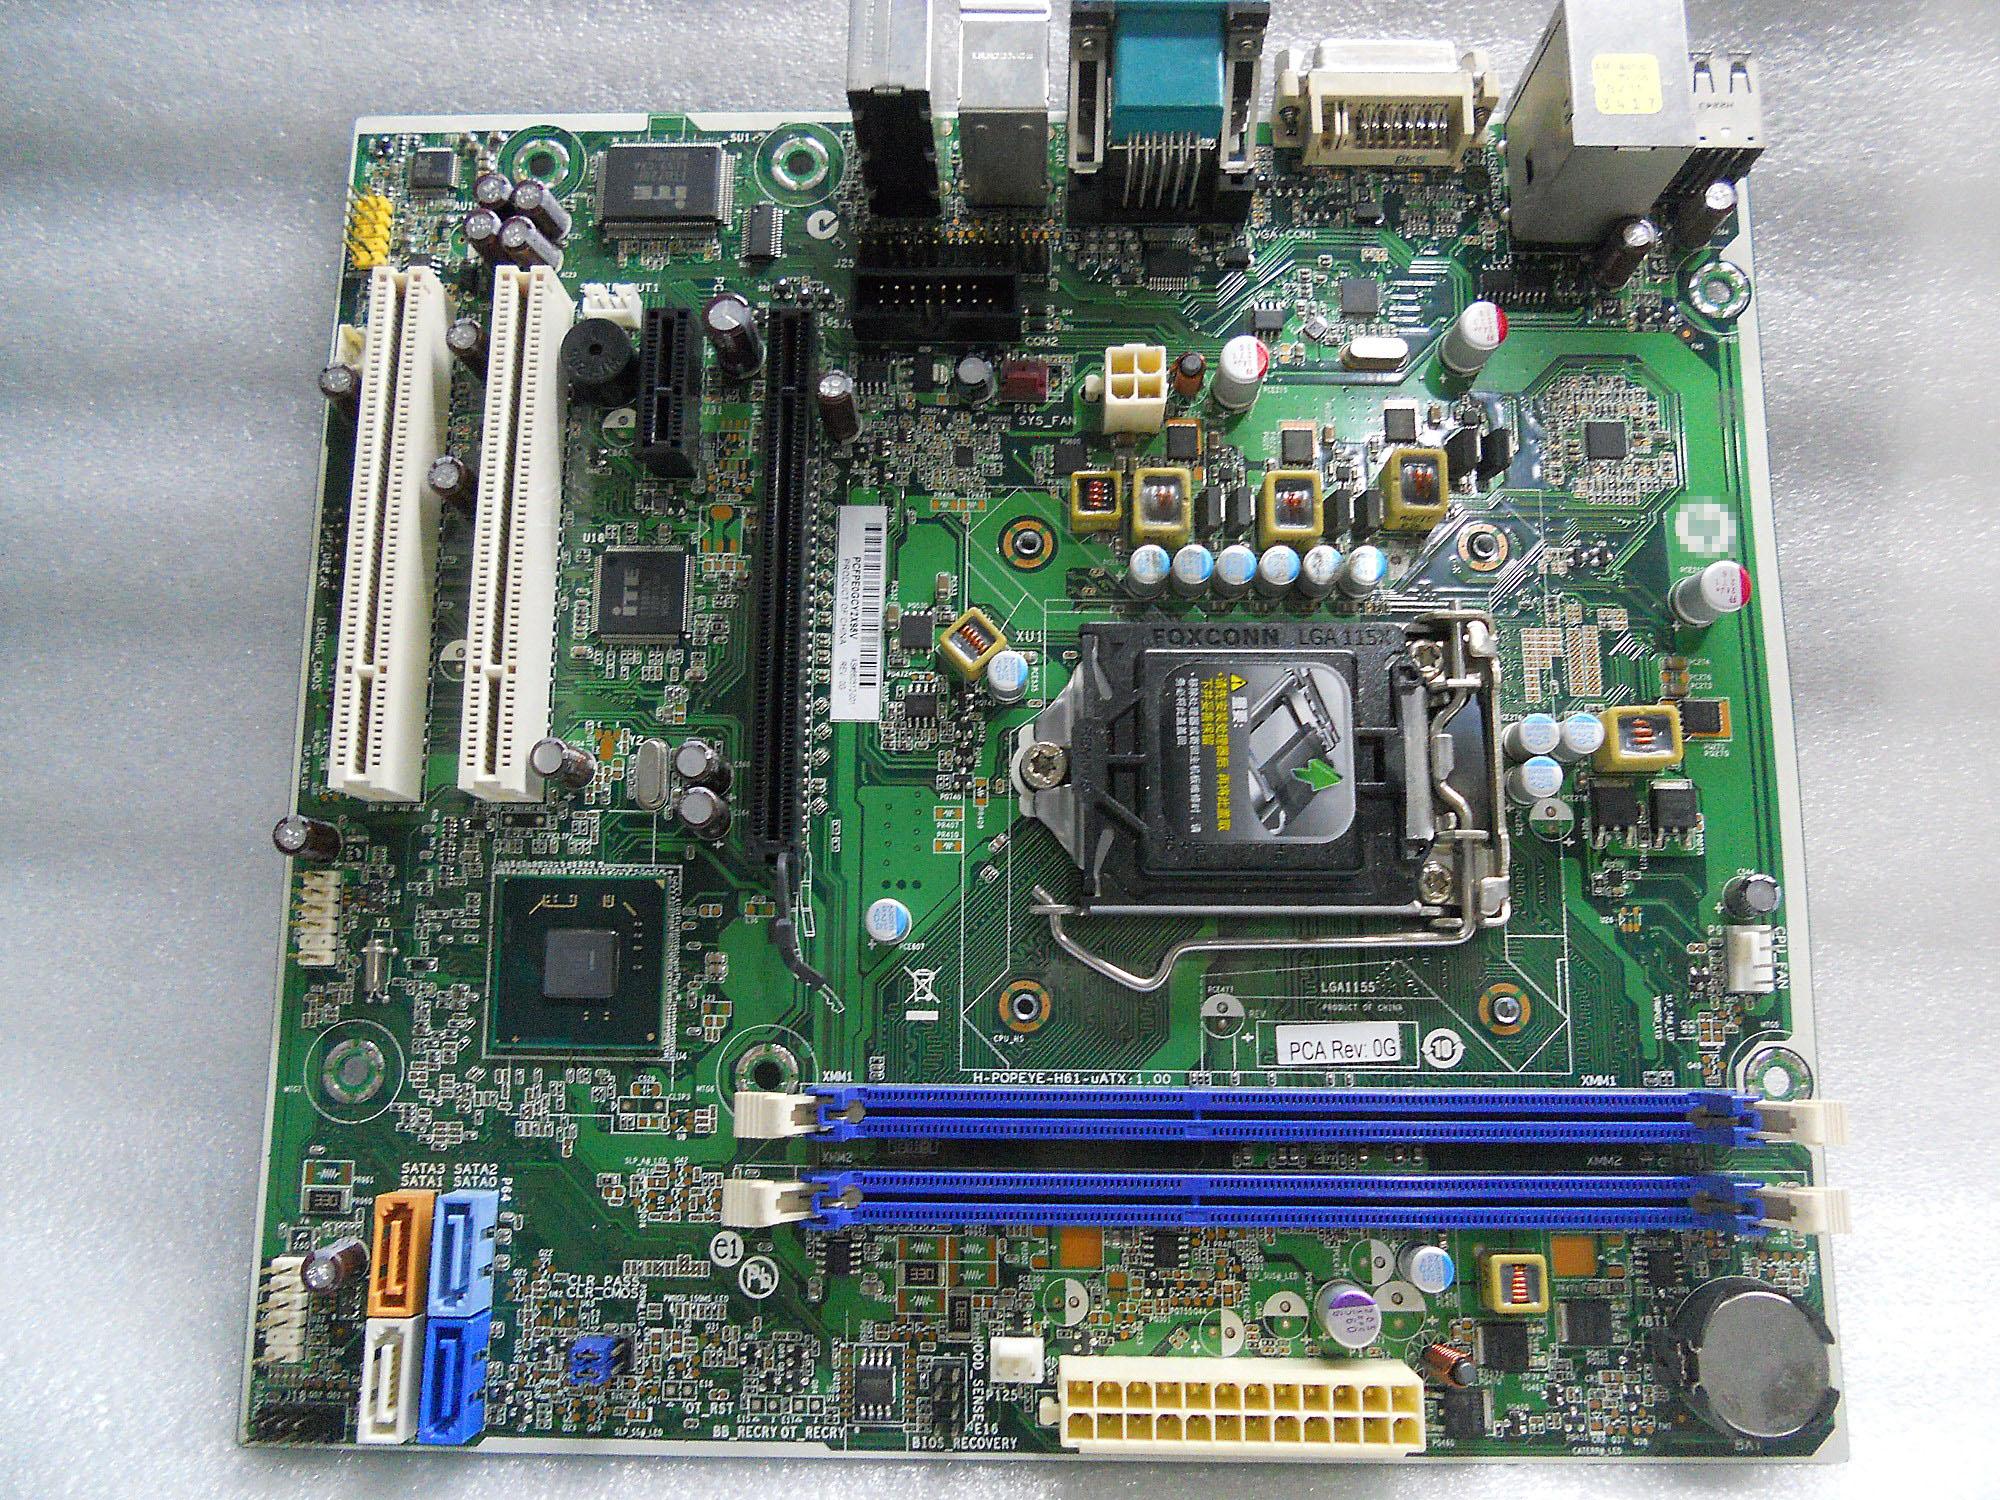 original desktop motherboard 3330 3380 MT SFF 694617-001 660512-001 H61 DDR3 LGA1155 mainboard dc5850 ms 7500 sff mt desktop motherboard 461537 001 450725 001 100% tested good quality